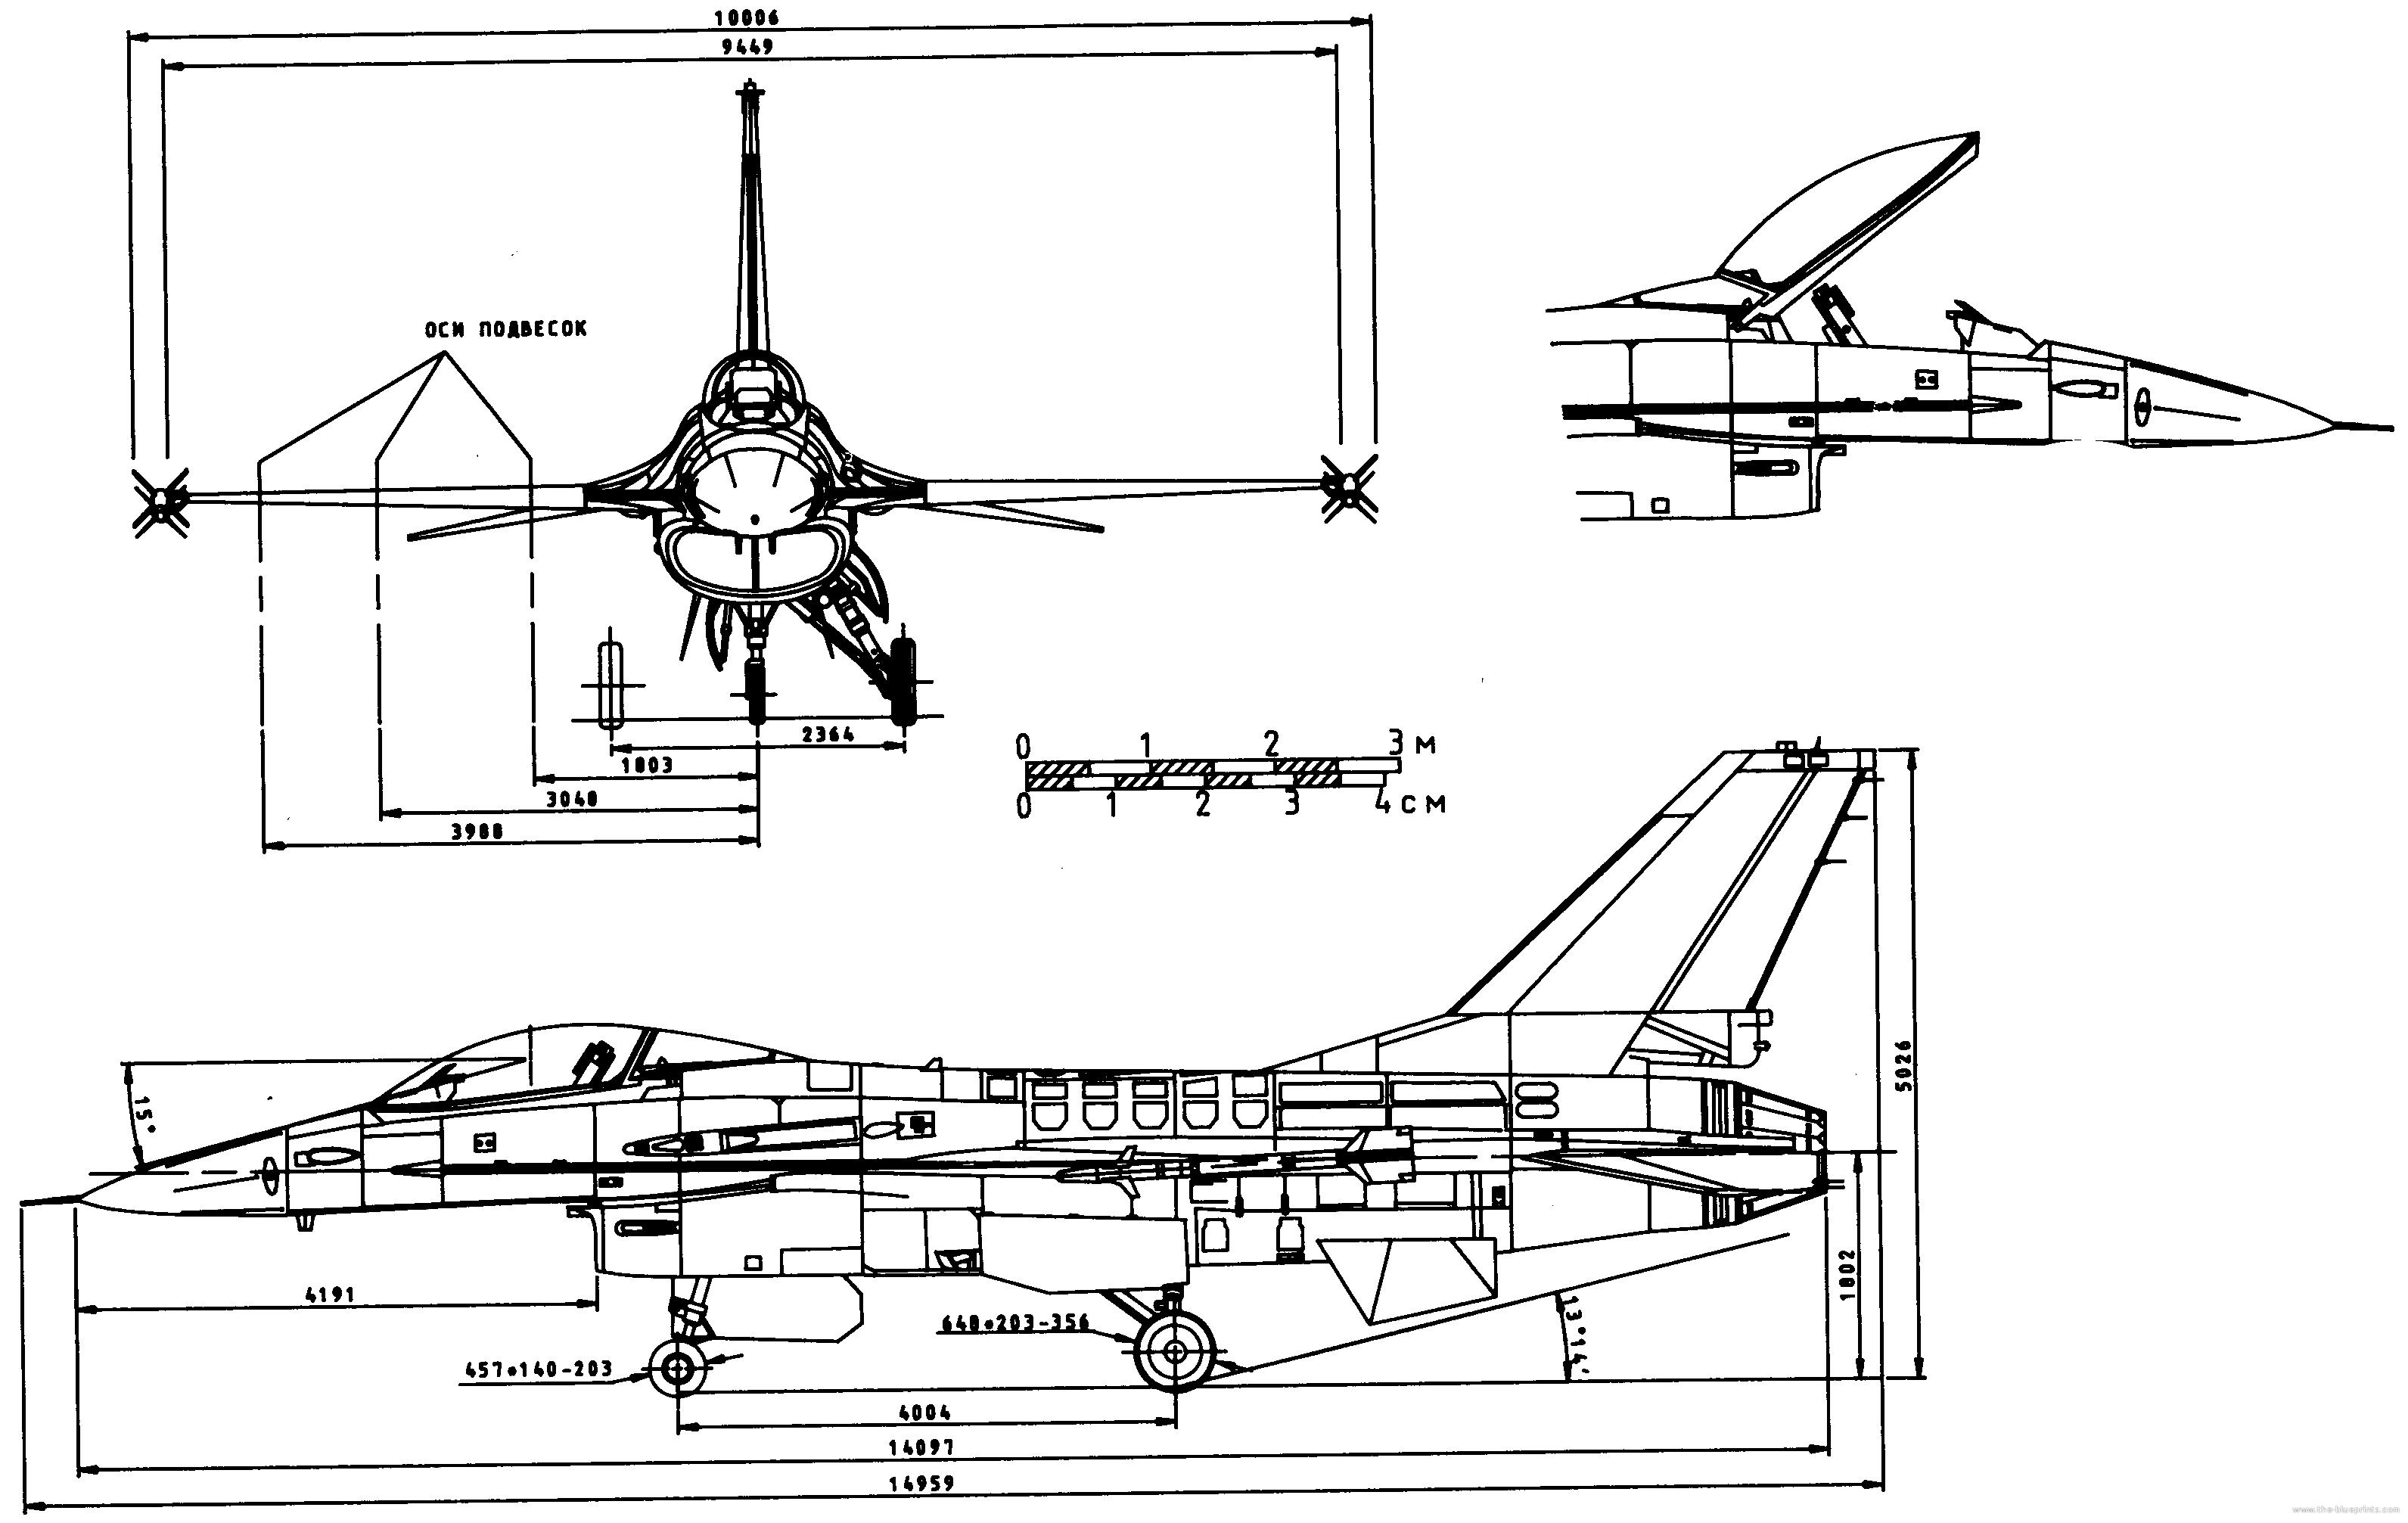 General Dynamics F-16 Fighting Falcon-59f894a6d.png